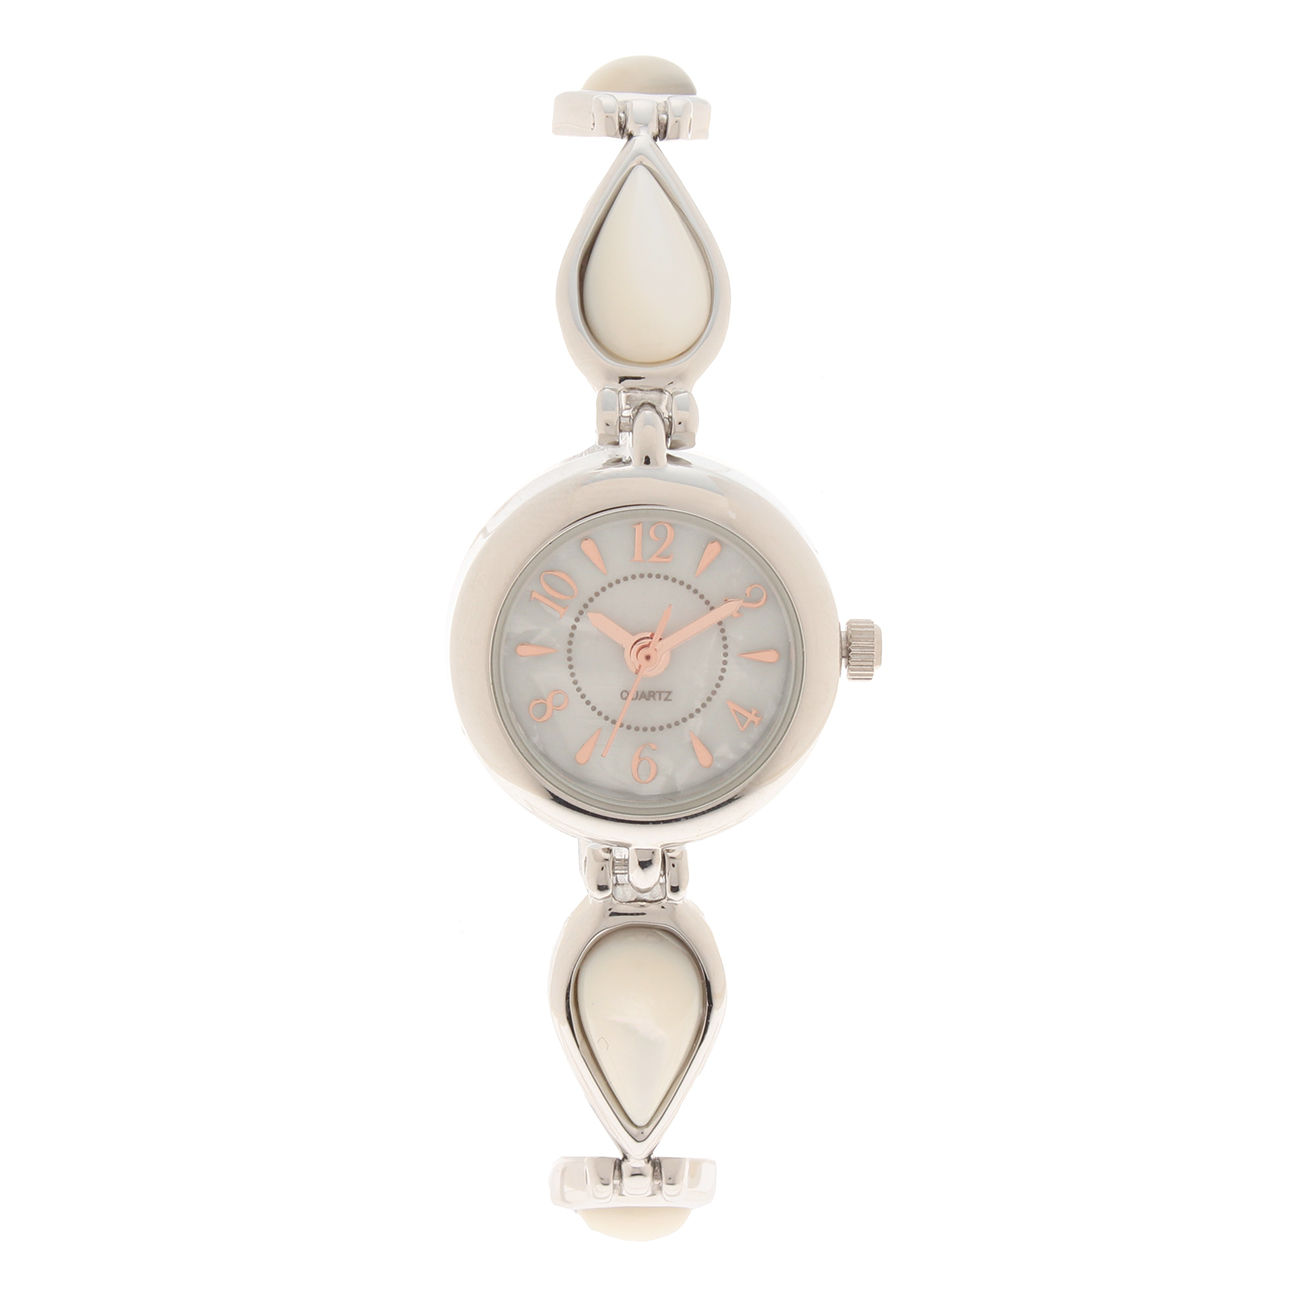 【passage mignon (パサージュ ミニョン)】天然石風ティアドロップベルト腕時計レディース 雑貨 腕時計 ホワイト